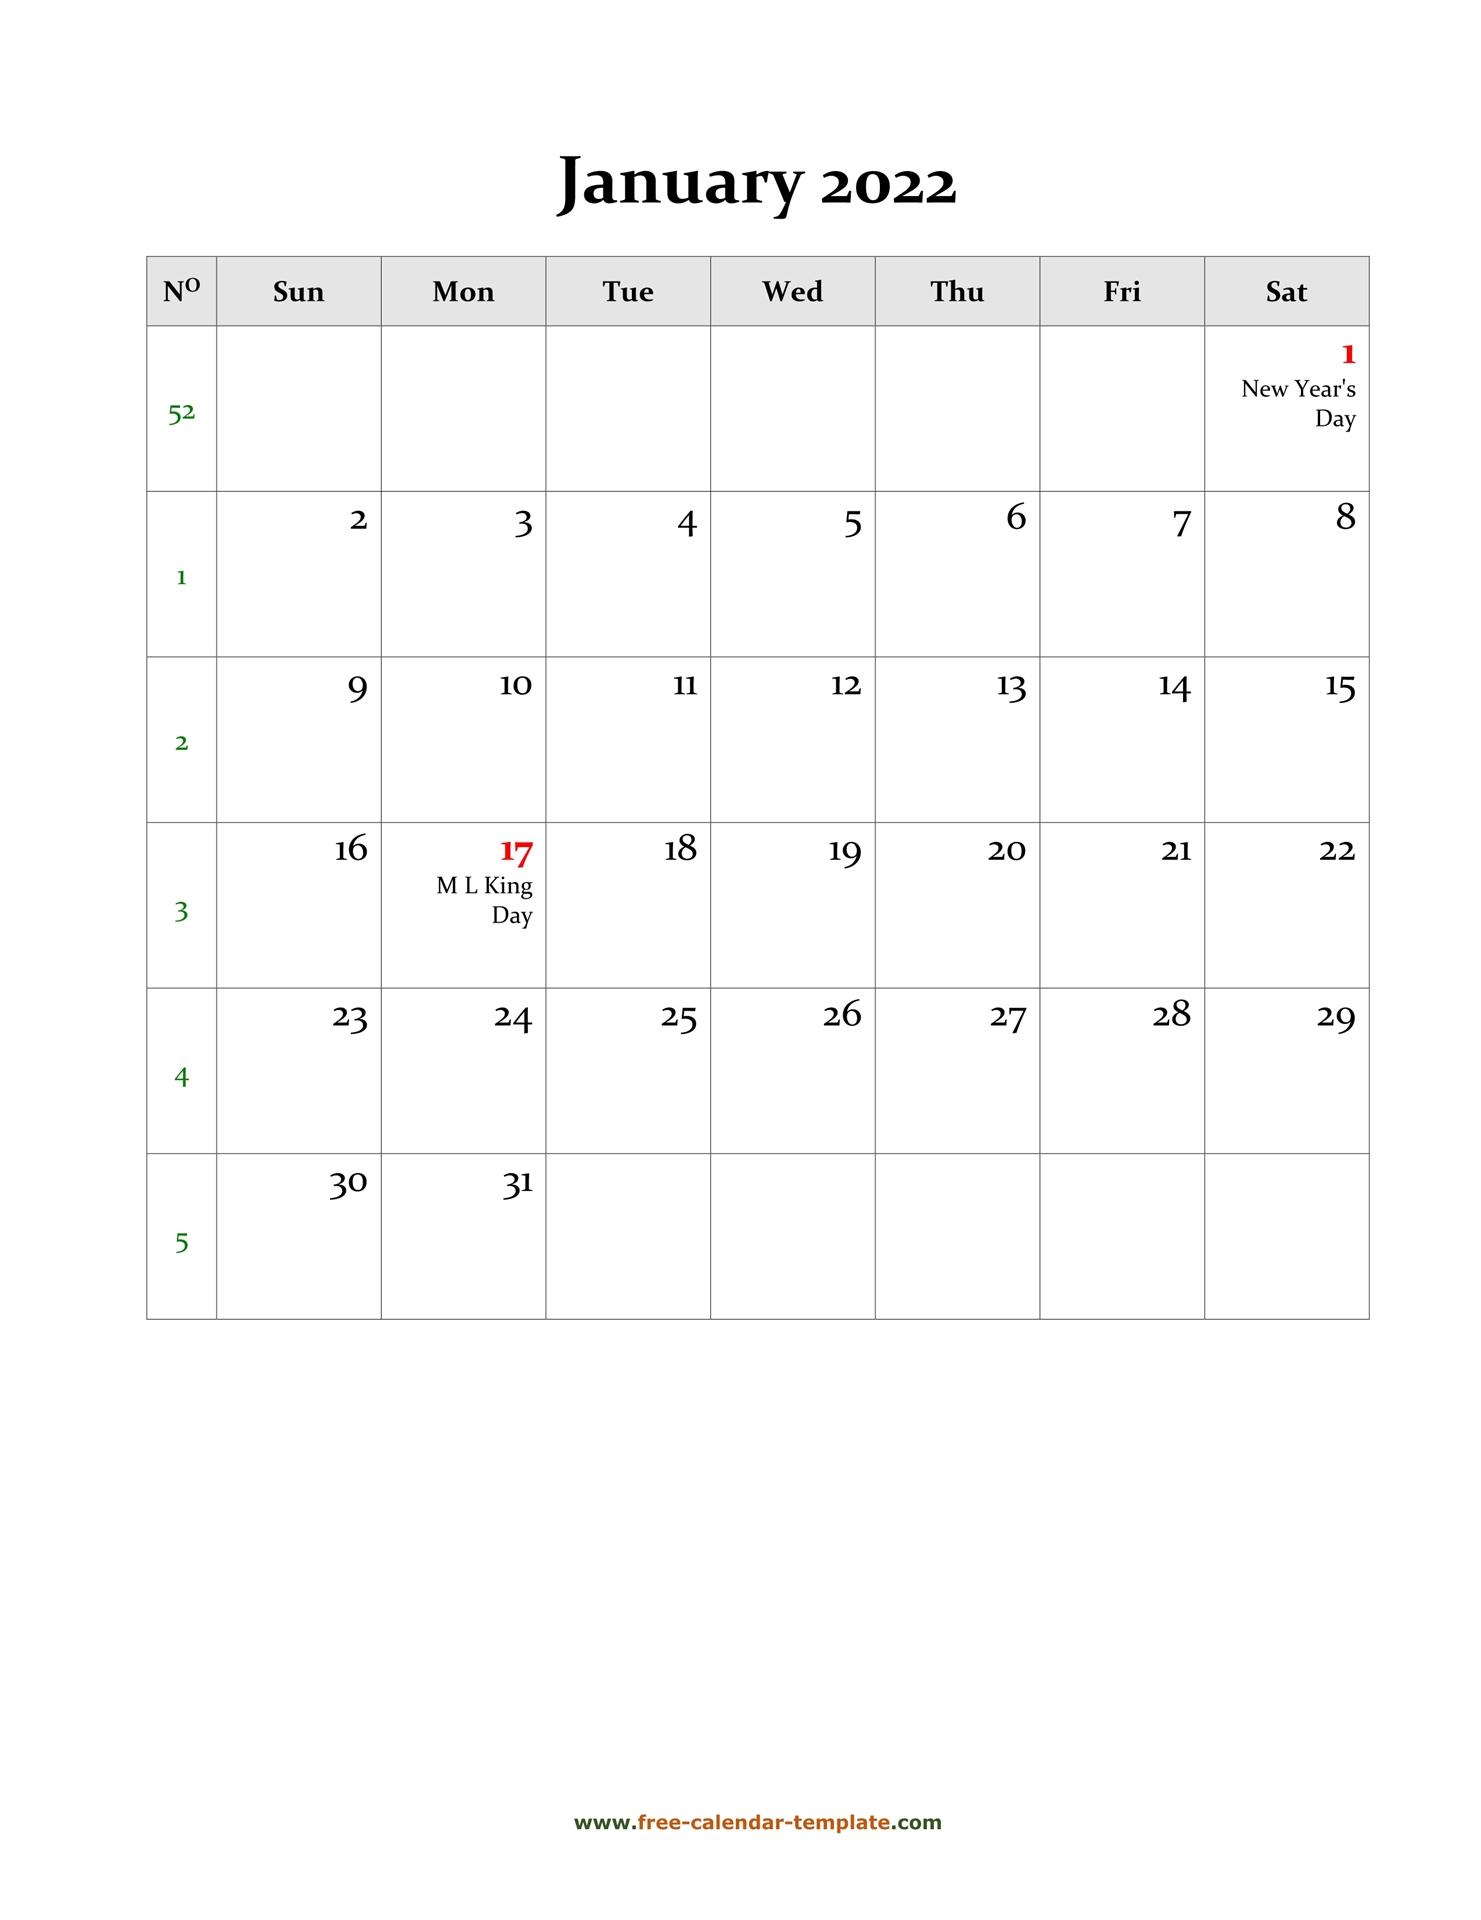 January 2022 Free Calendar Tempplate | Free Calendar Template Within Landscape Calendar January 2022